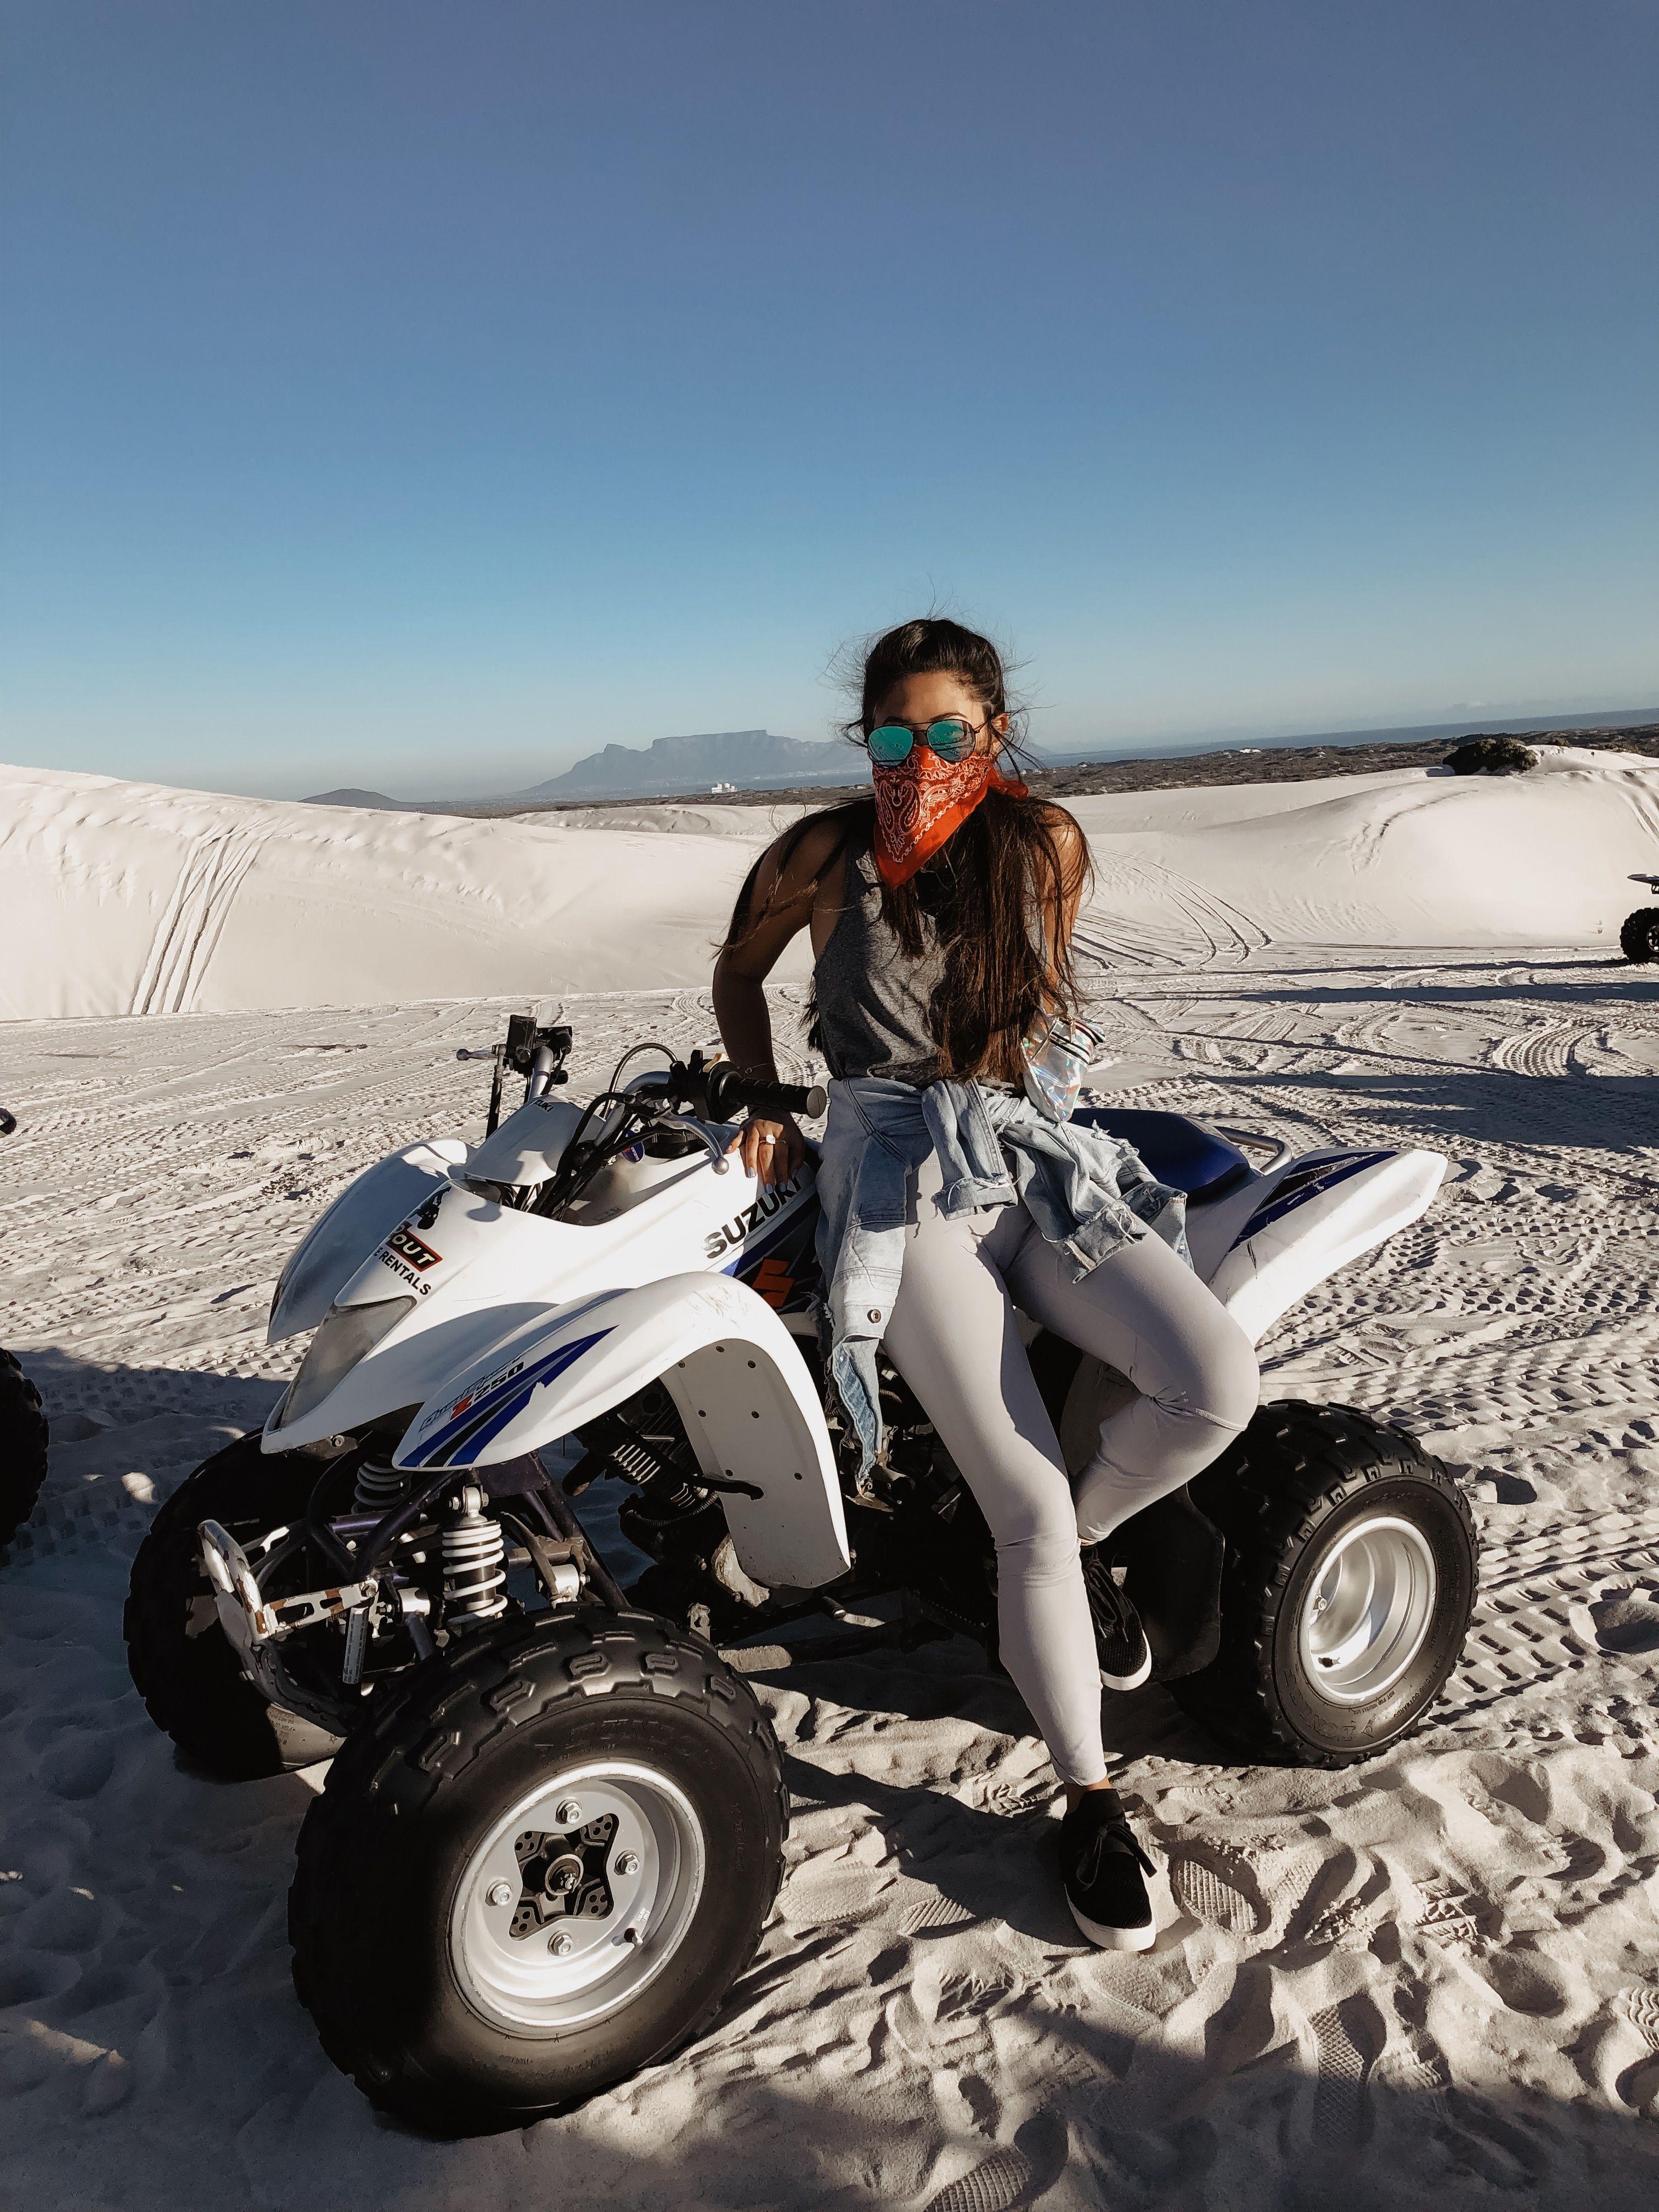 Sand Dunes Quad Biking Outfit 4 Wheeler Outdoor South Africa